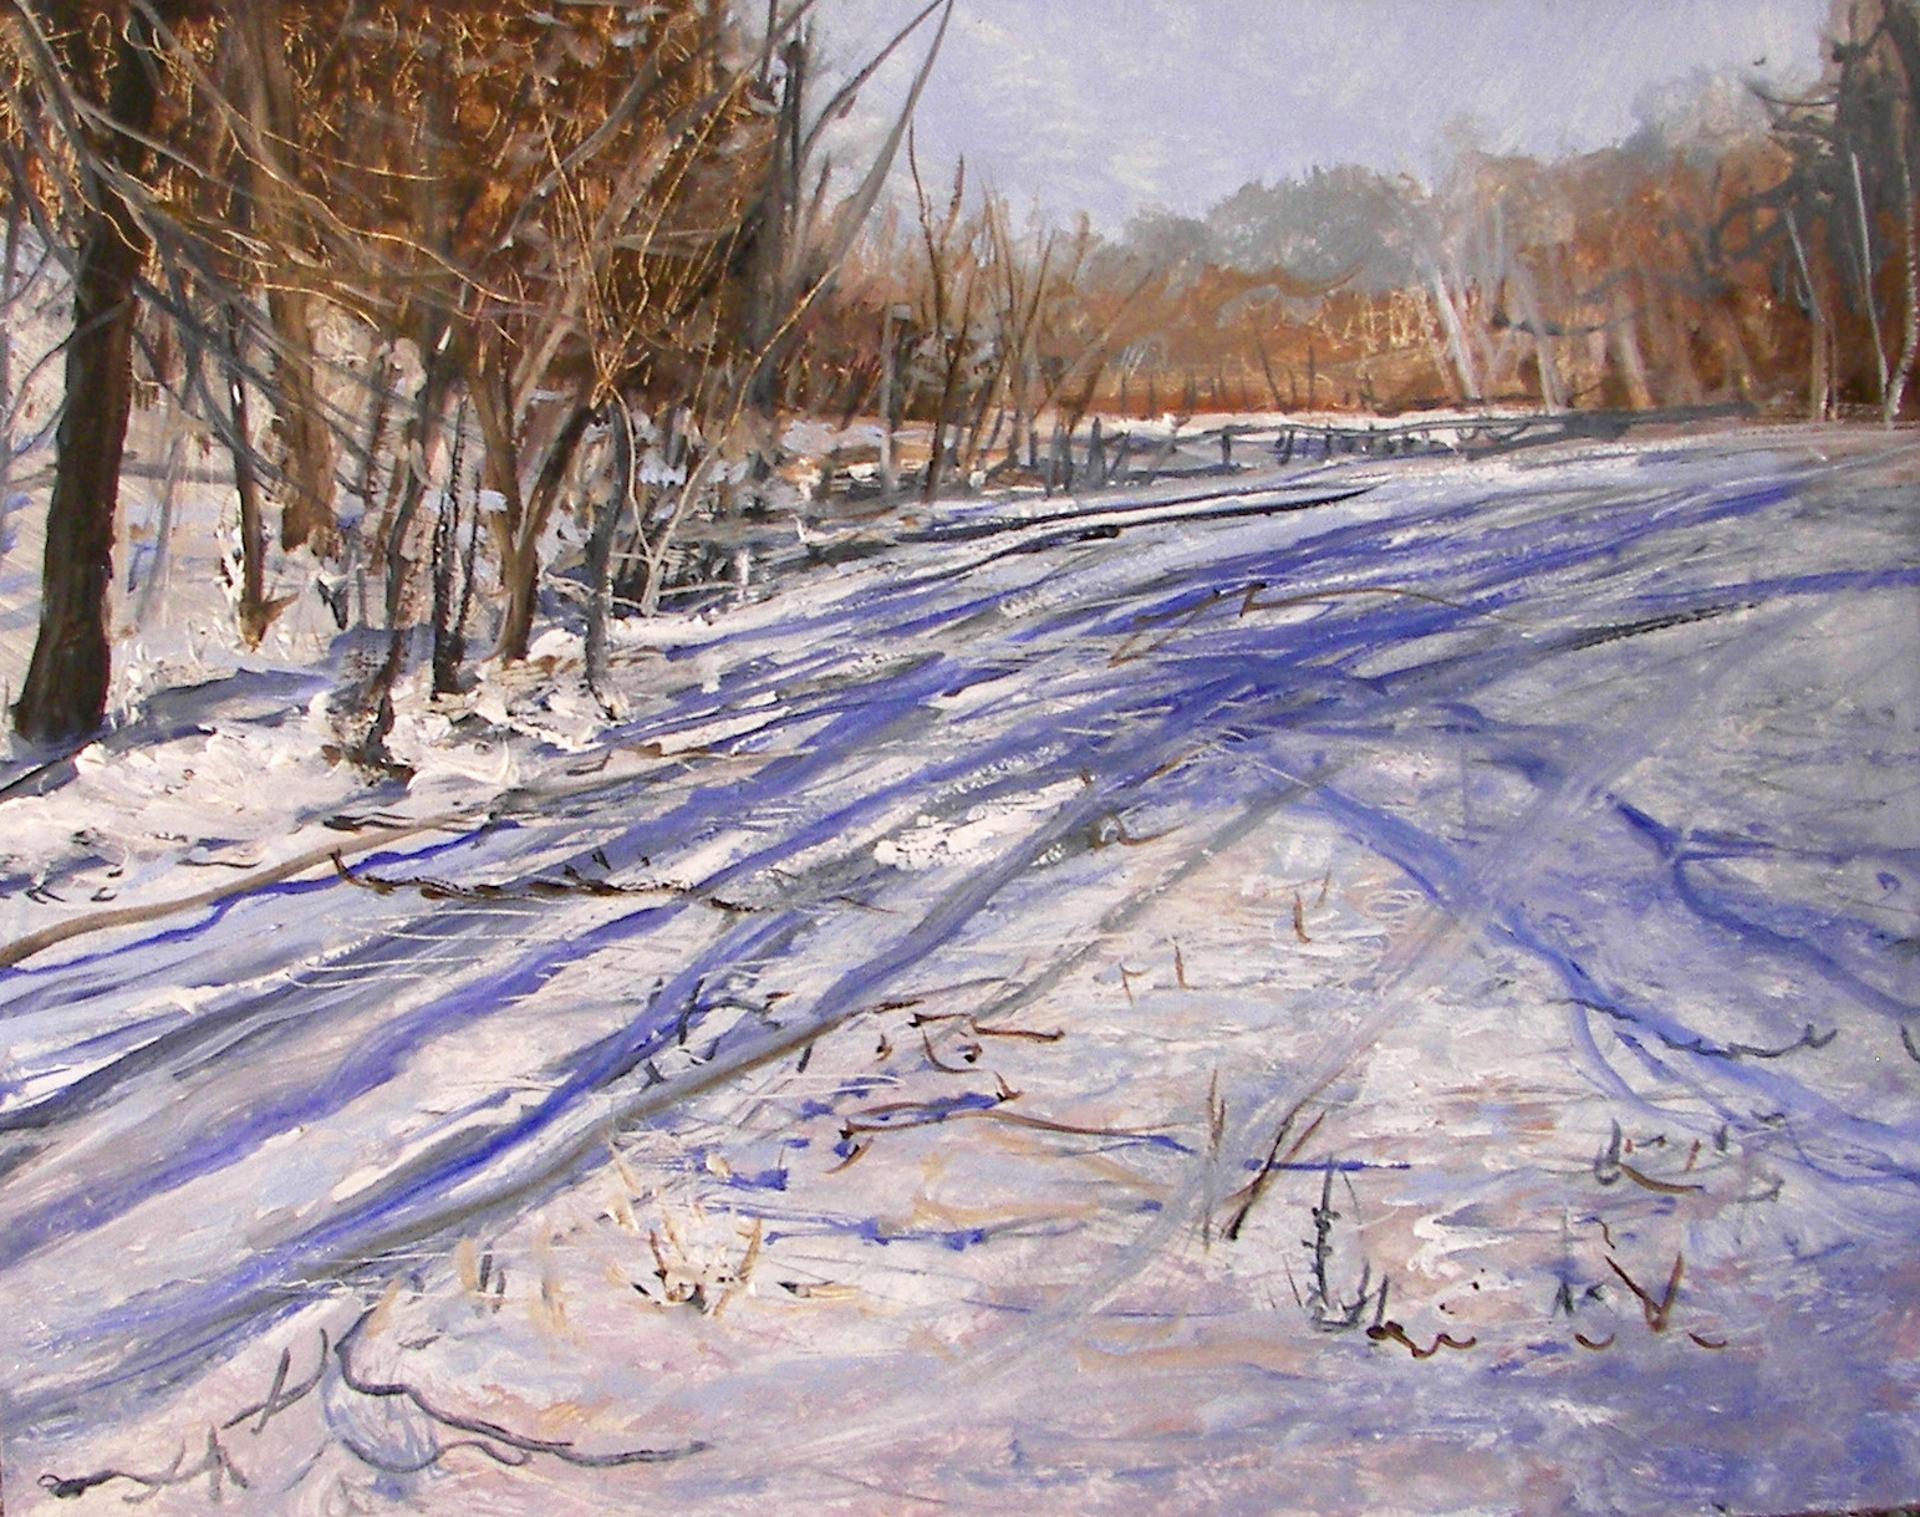 Winter Shadows by Frank Baggett